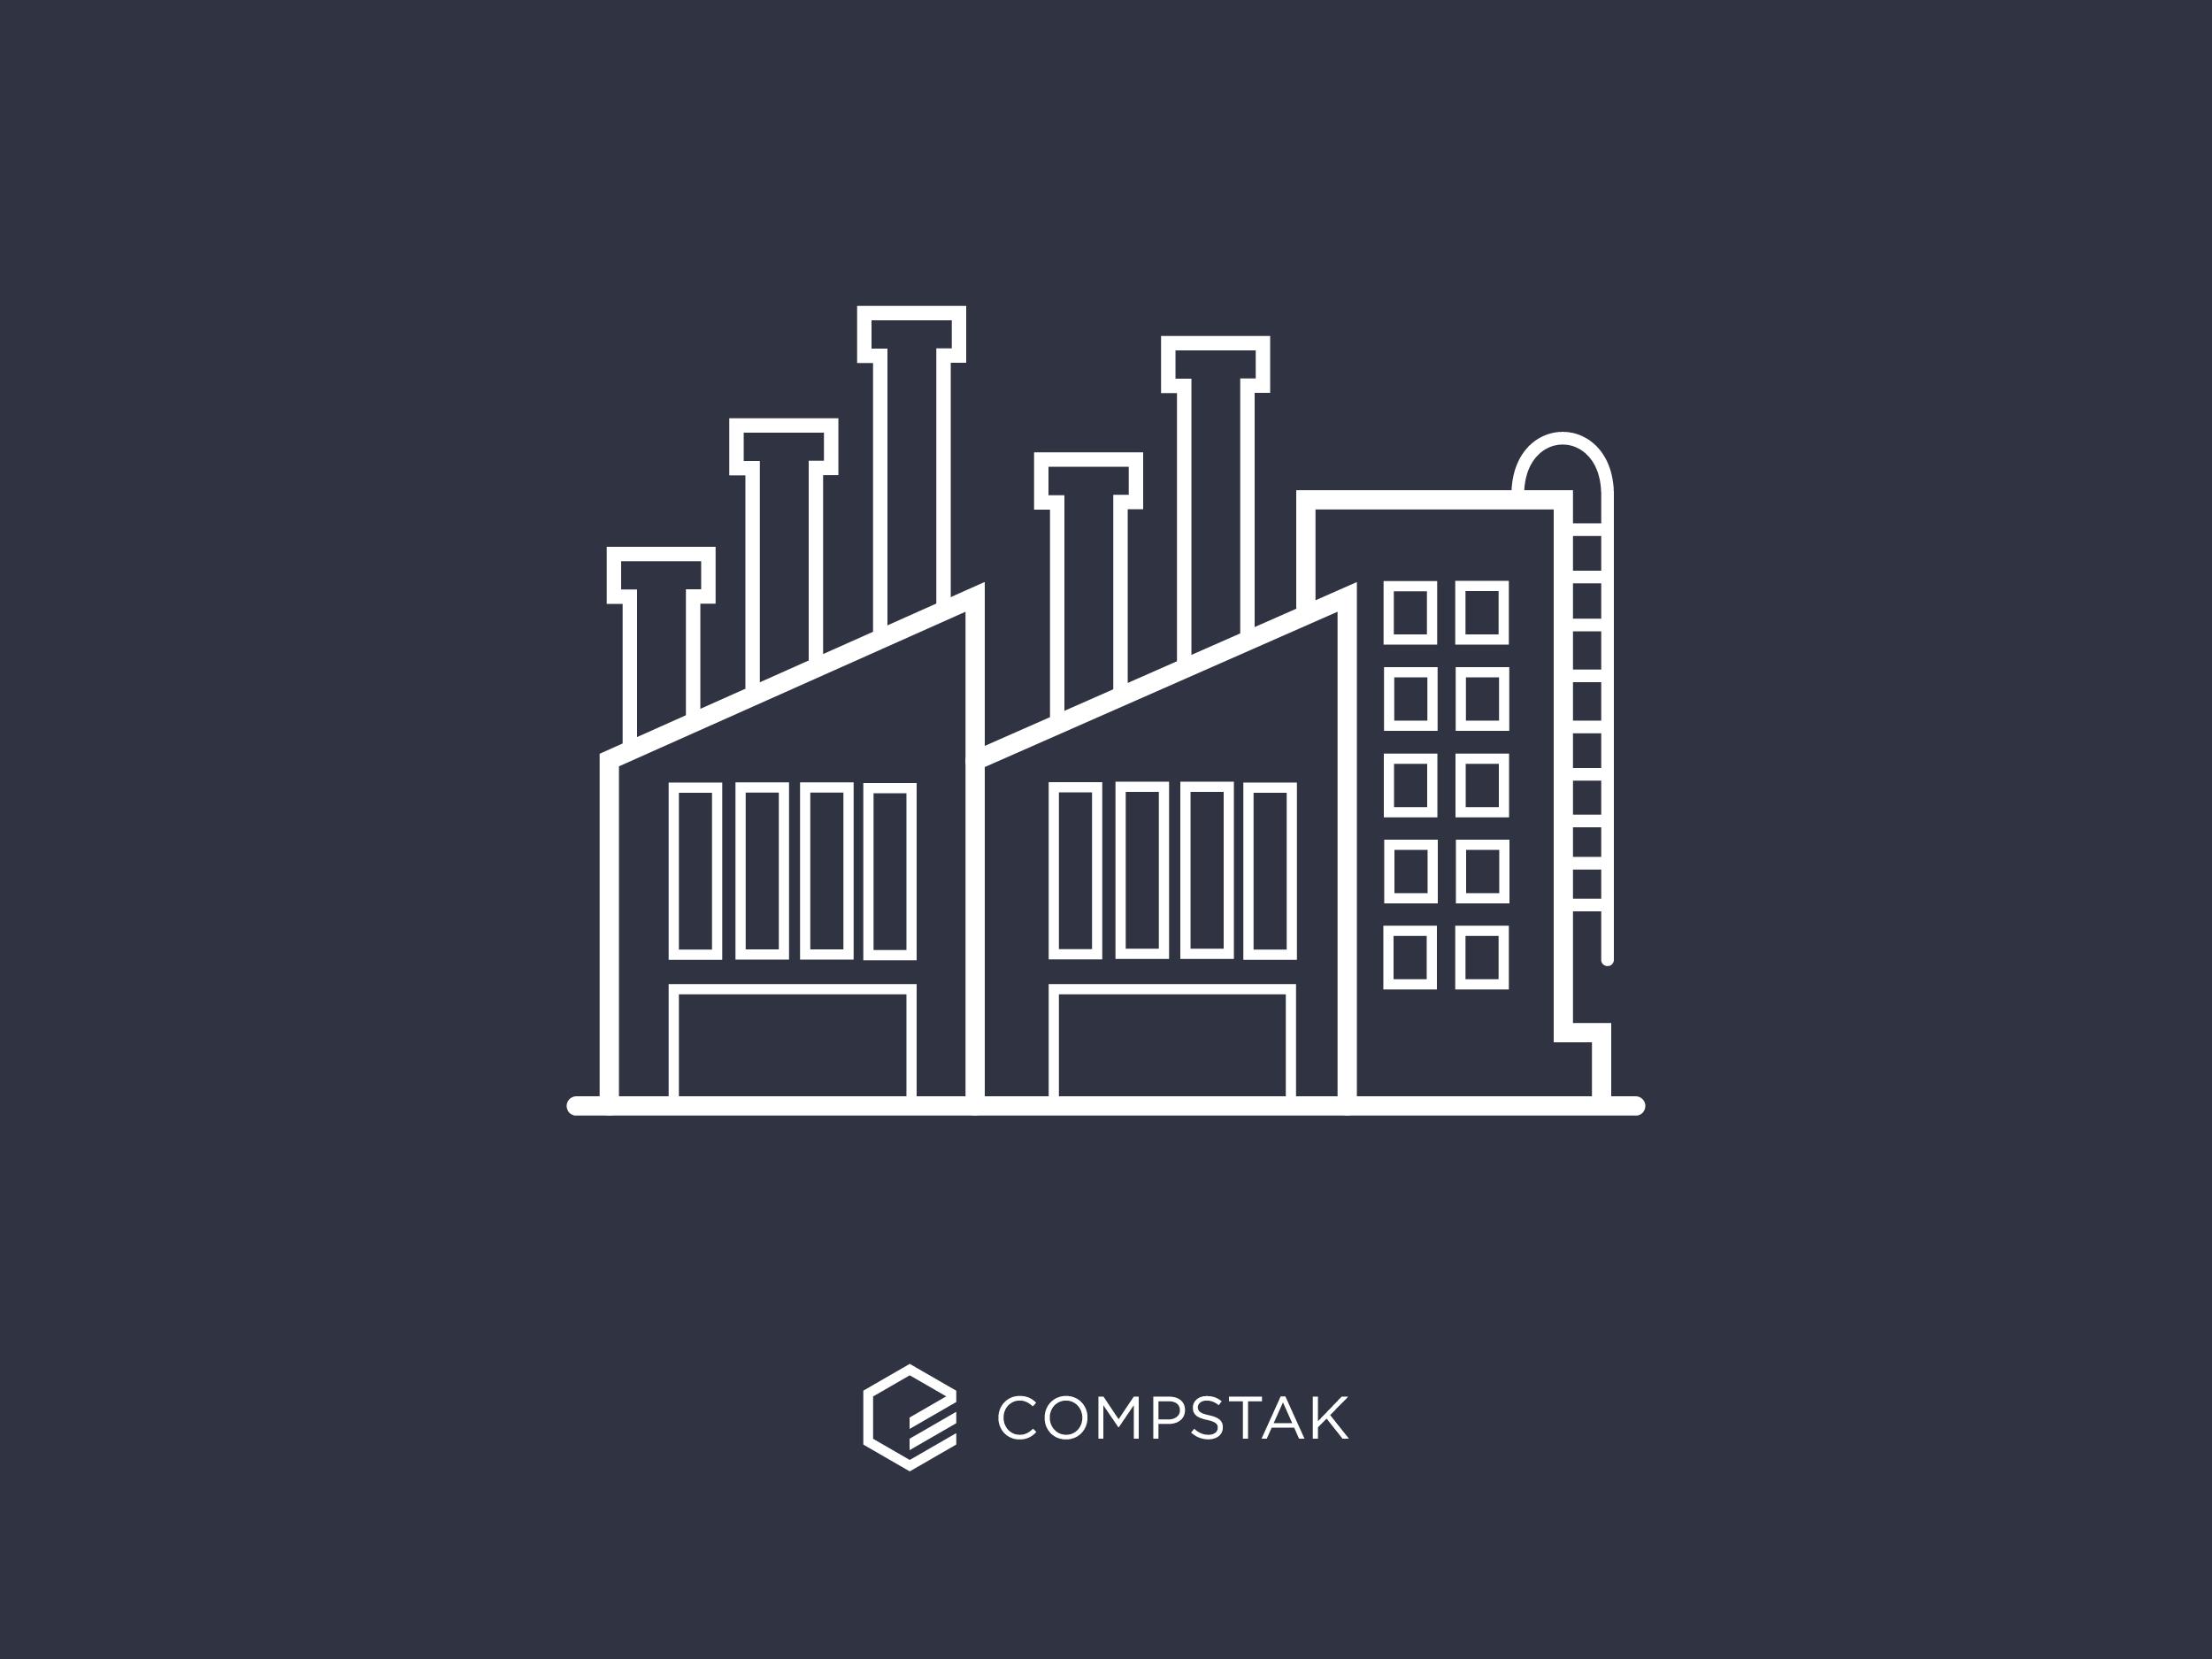 Compstack